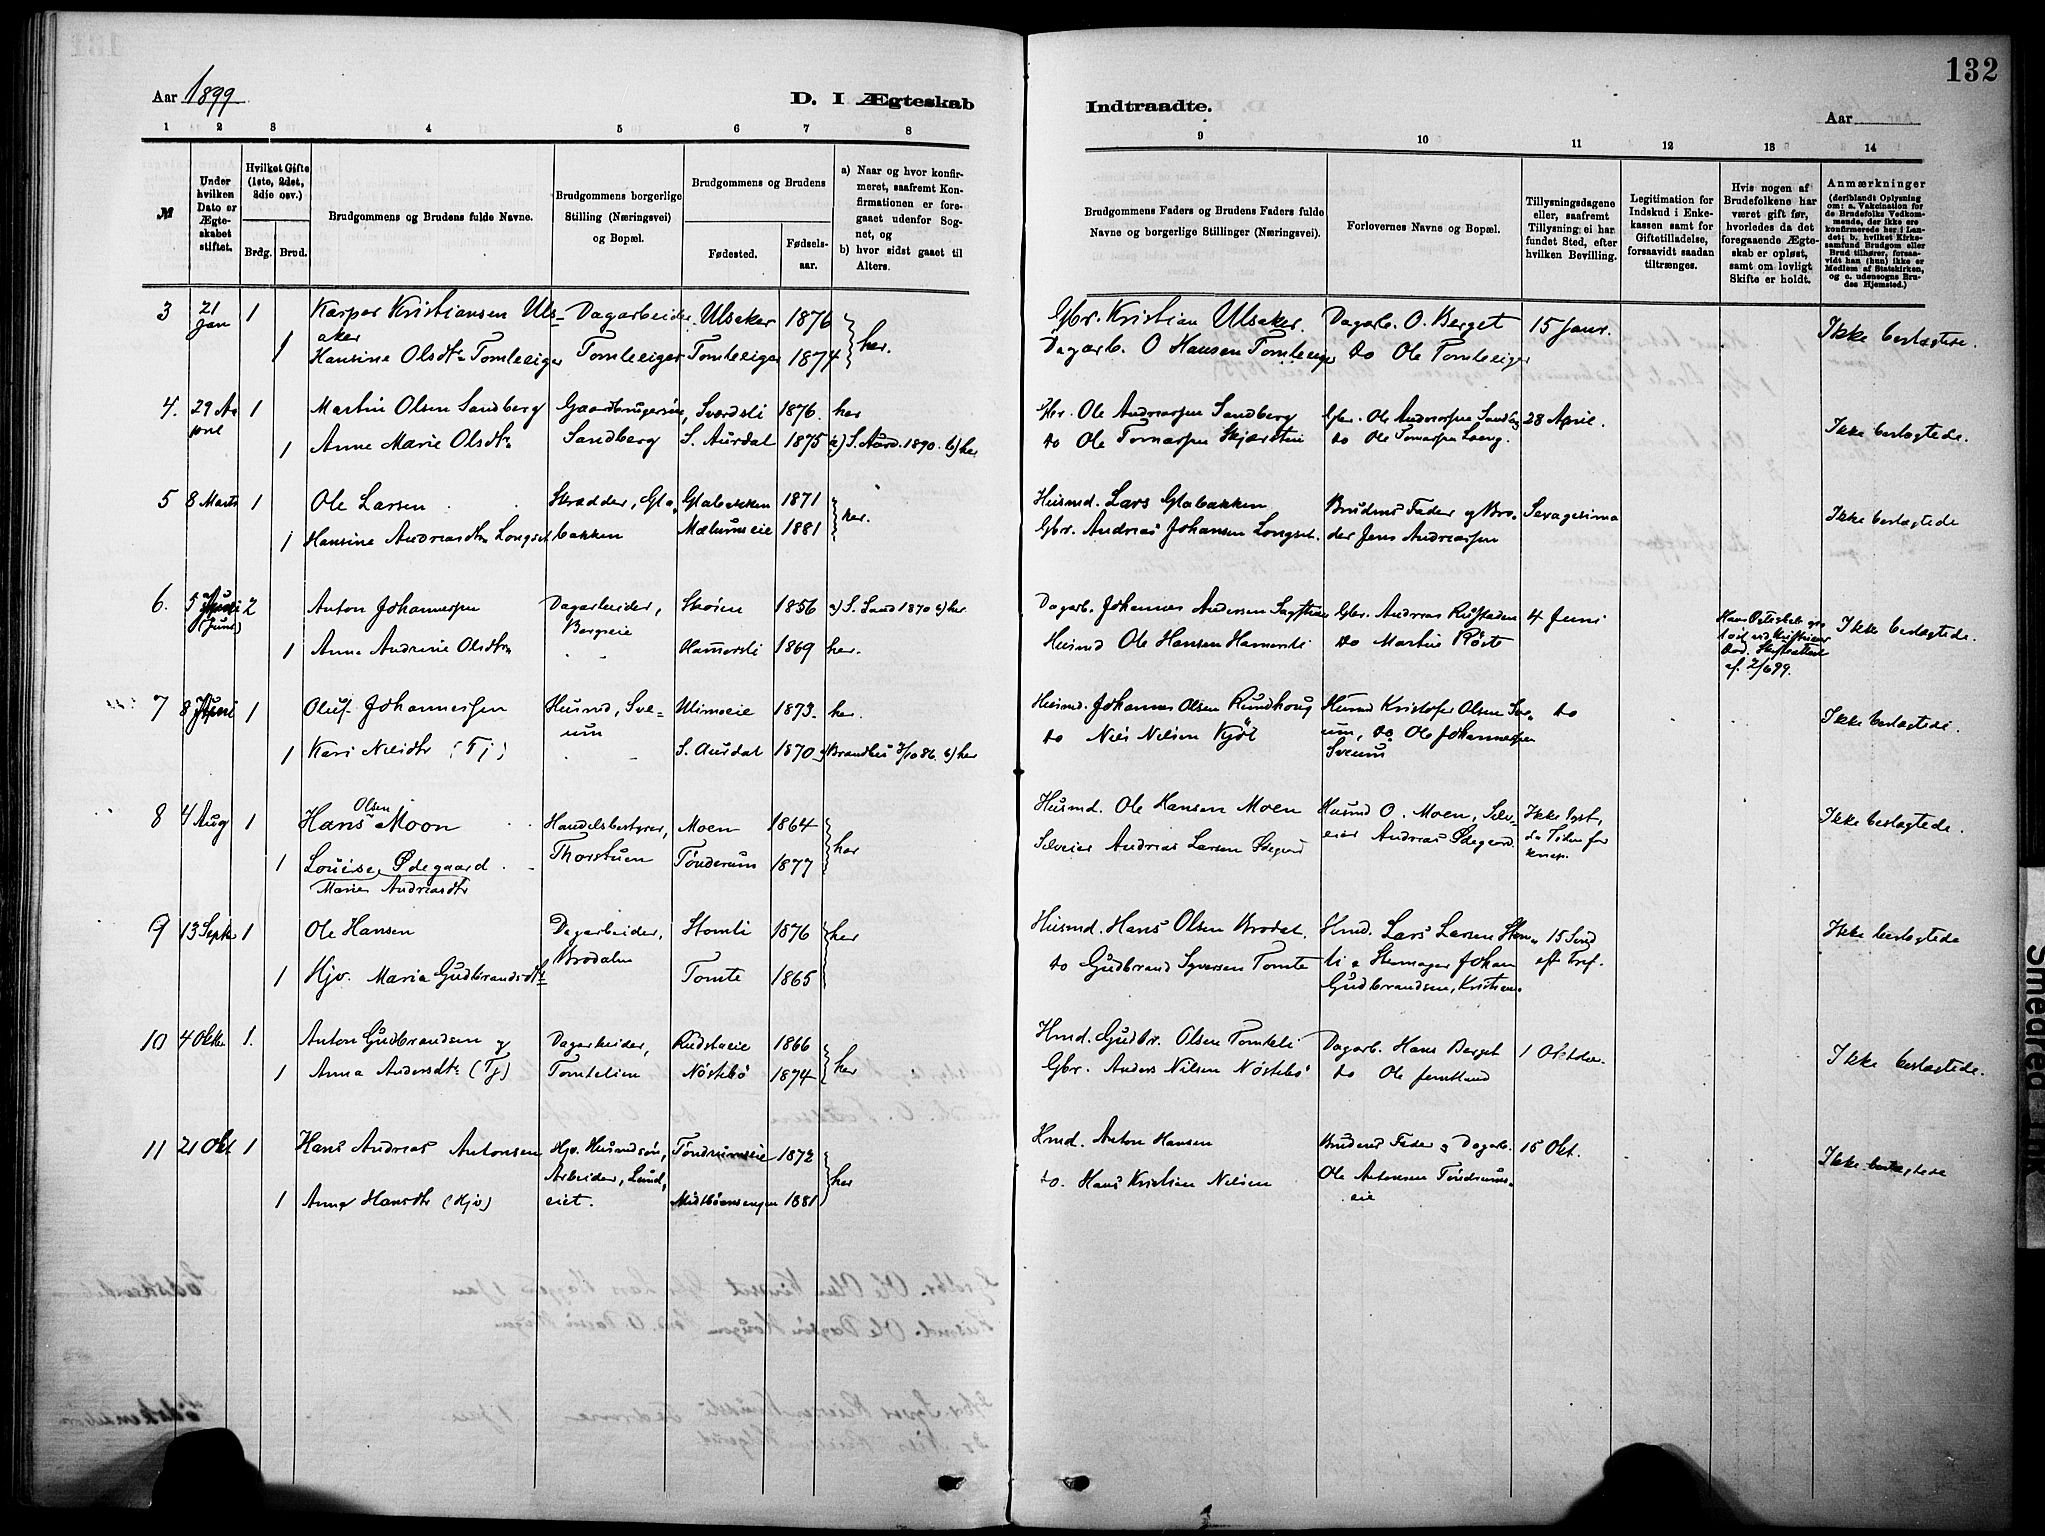 SAH, Nordre Land prestekontor, Ministerialbok nr. 5, 1882-1903, s. 132